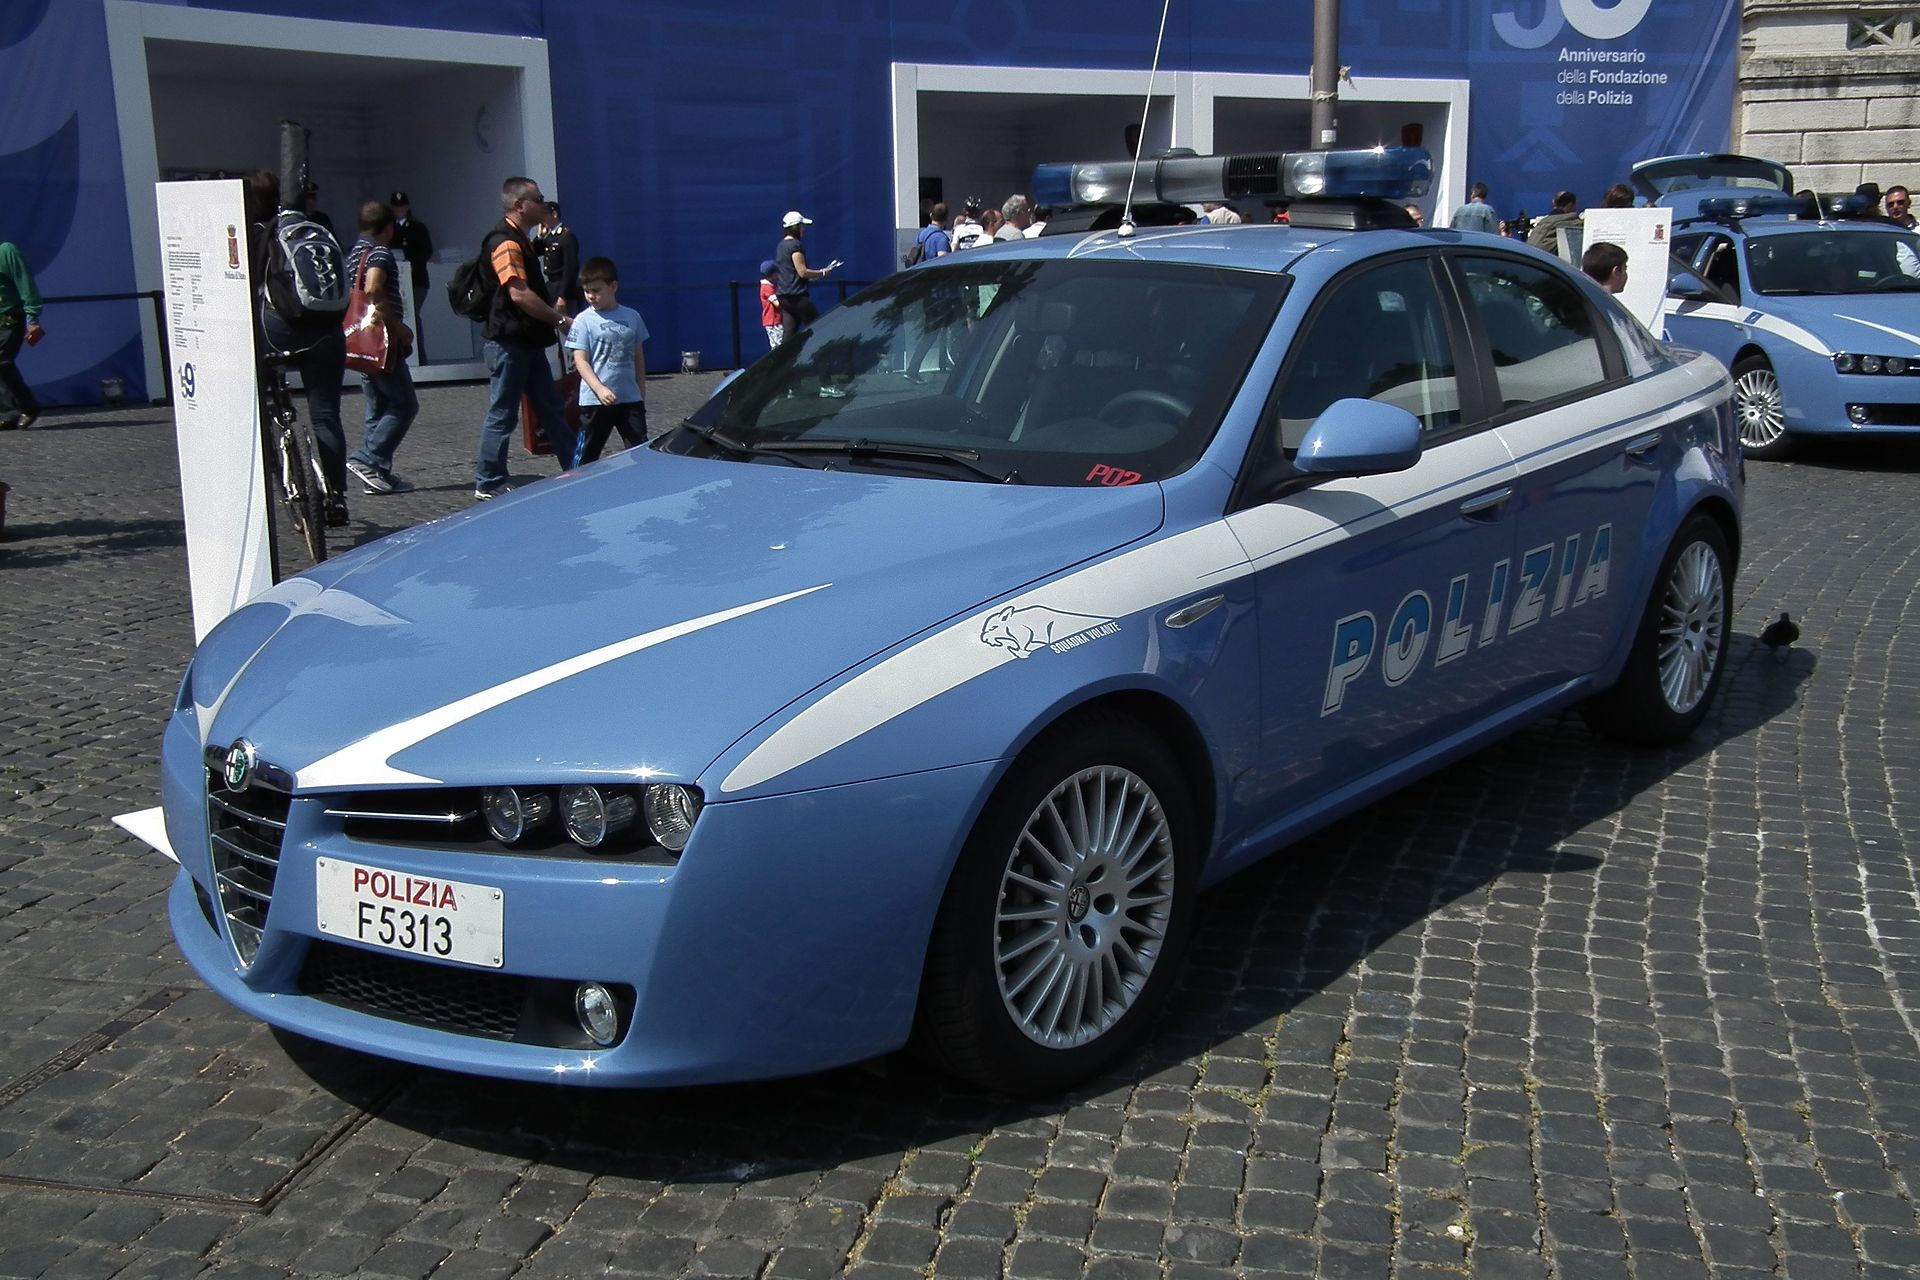 Polizia Stradale - Wikipedia